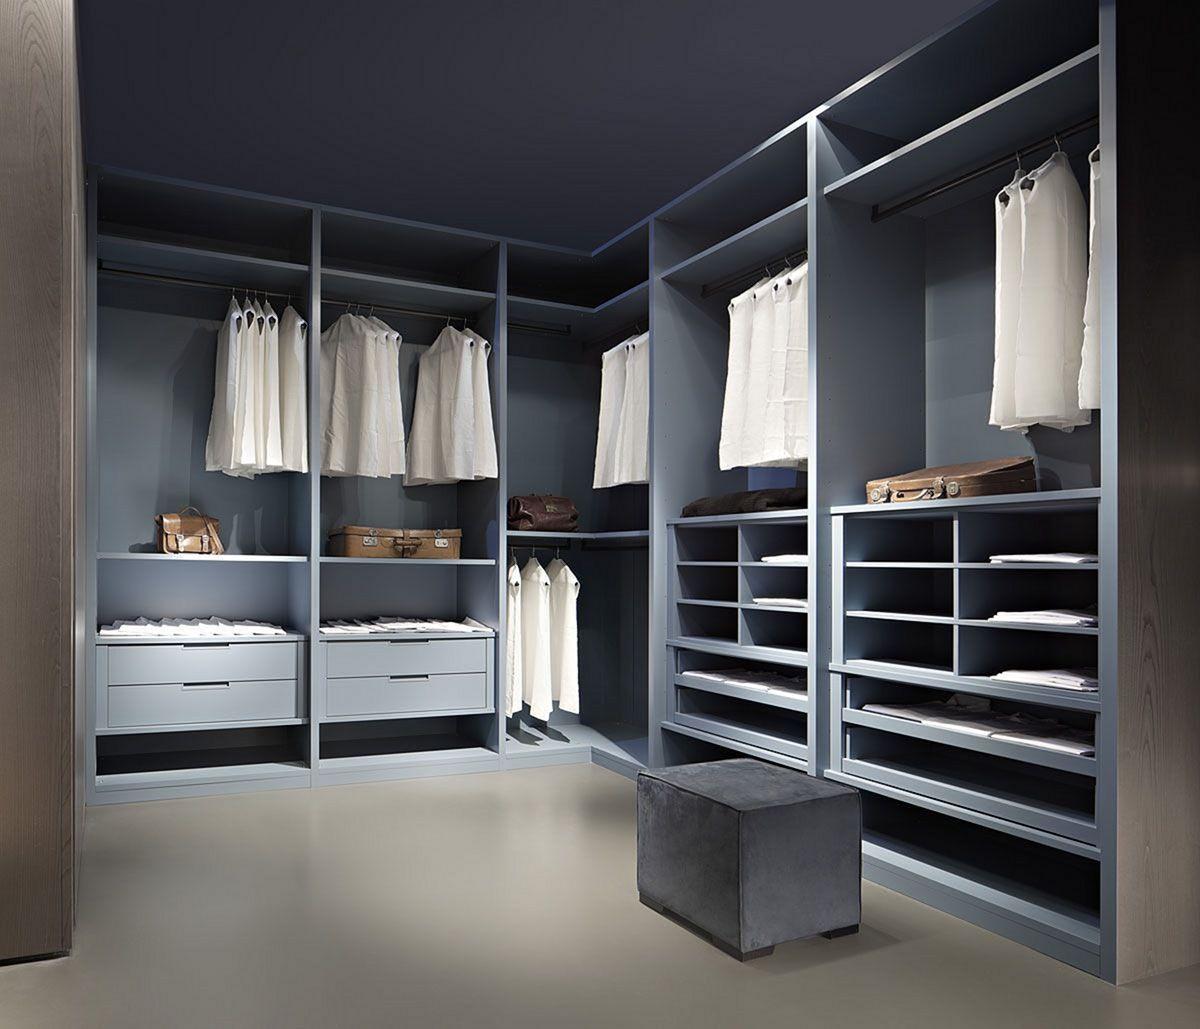 30 Modern Wardrobe Design For Beautiful Home Furniture Ideas Bedroom Closet Design Closet Designs Dressing Room Design